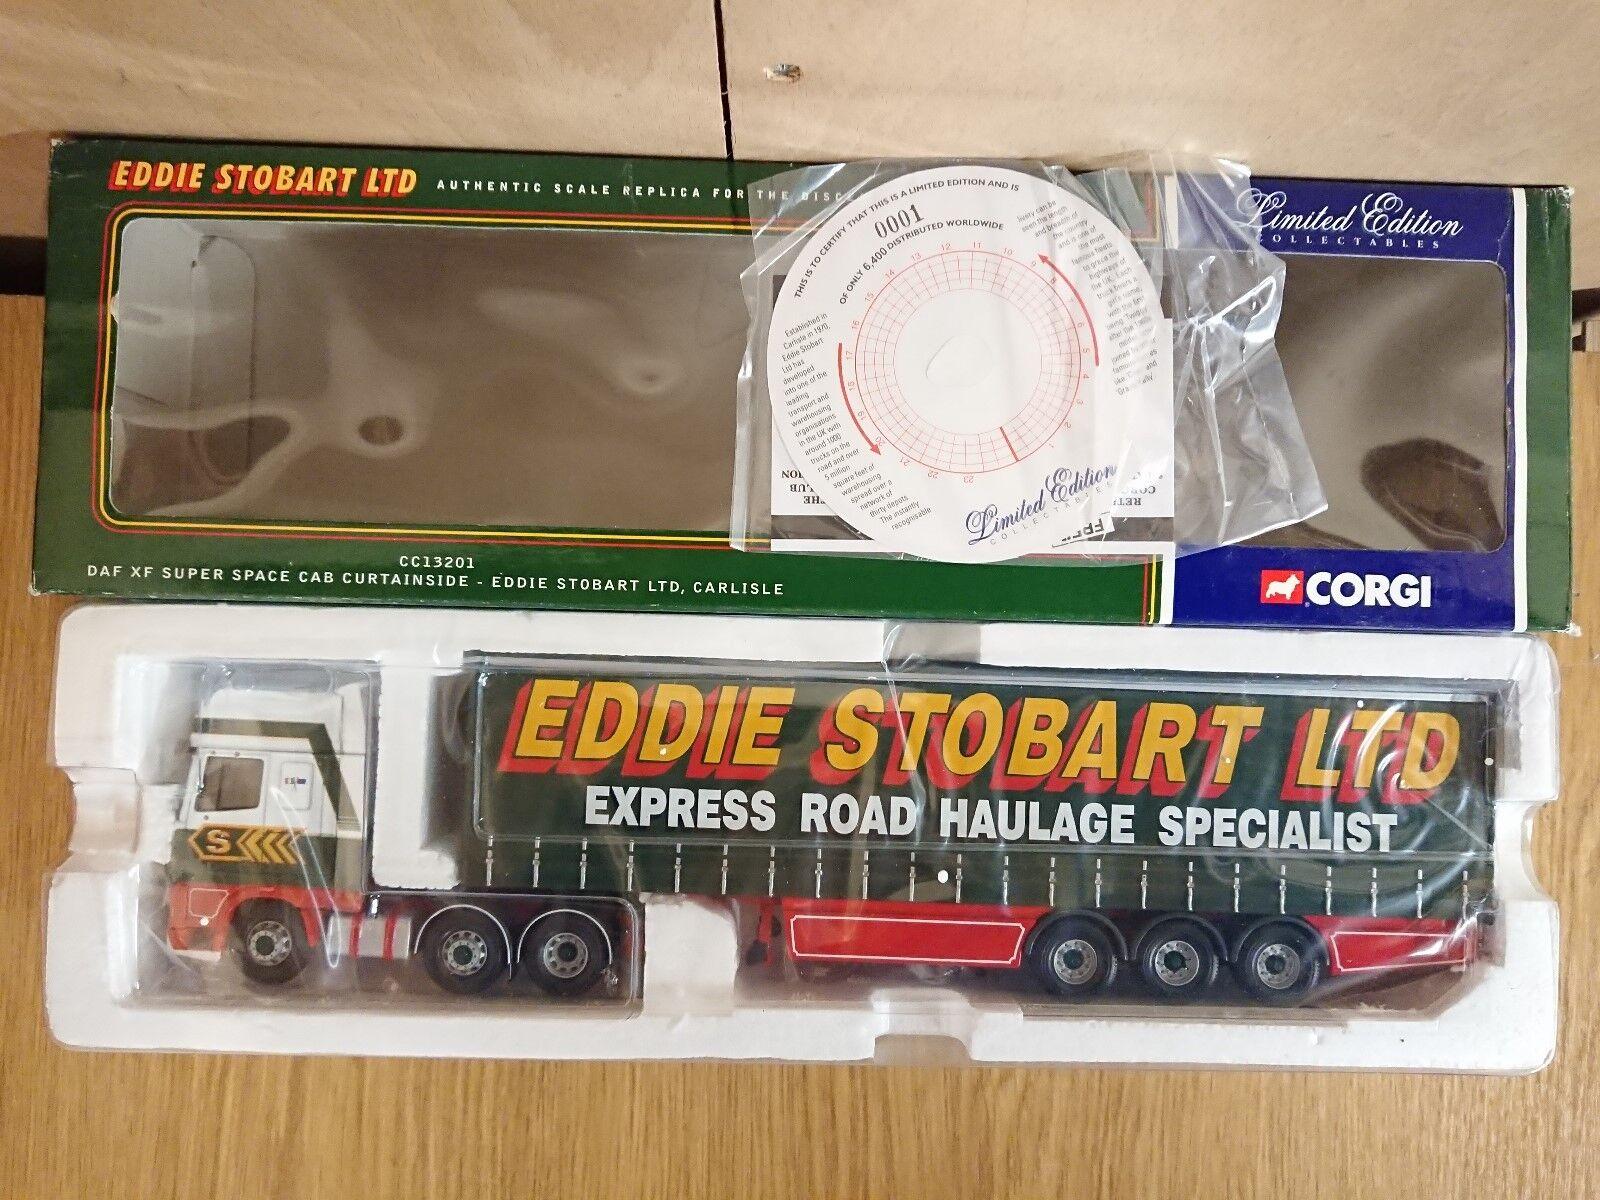 Corgi CC13201 DAF XF S. espacio Cab Curtainside Stobart Ltd Edit. Nº 0001 de 6400